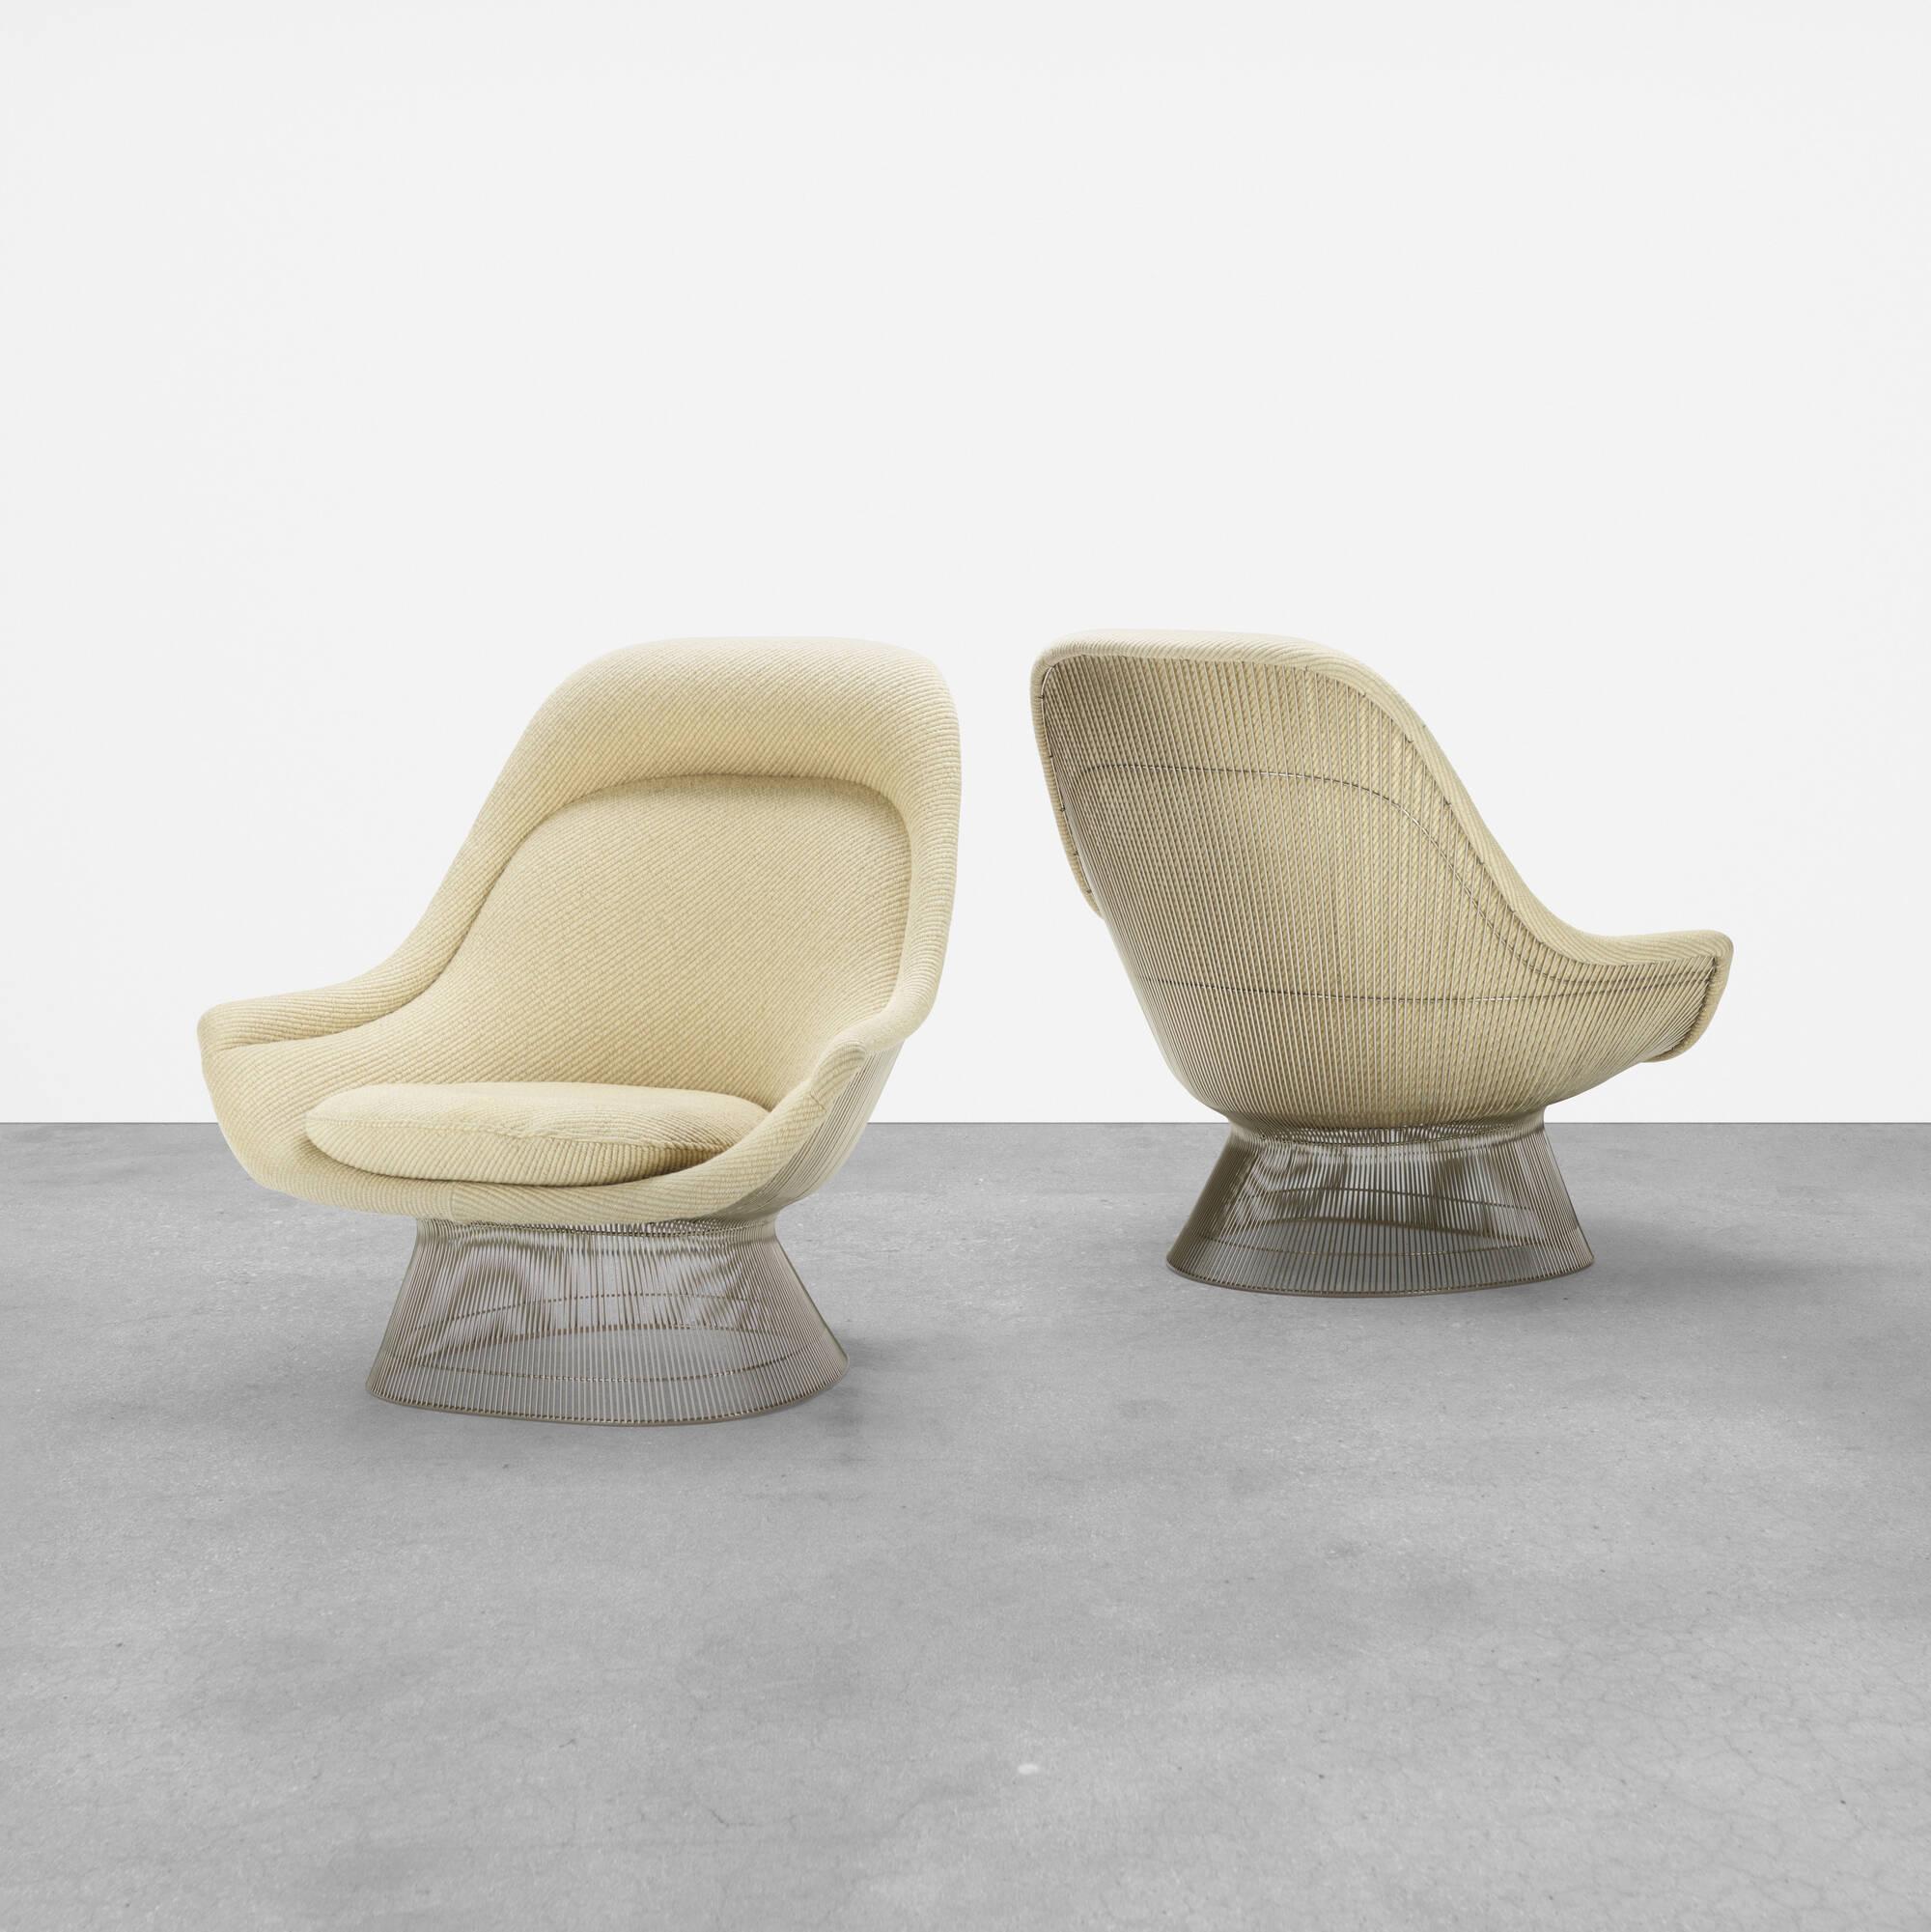 296: Warren Platner / lounge chairs, pair (1 of 4)